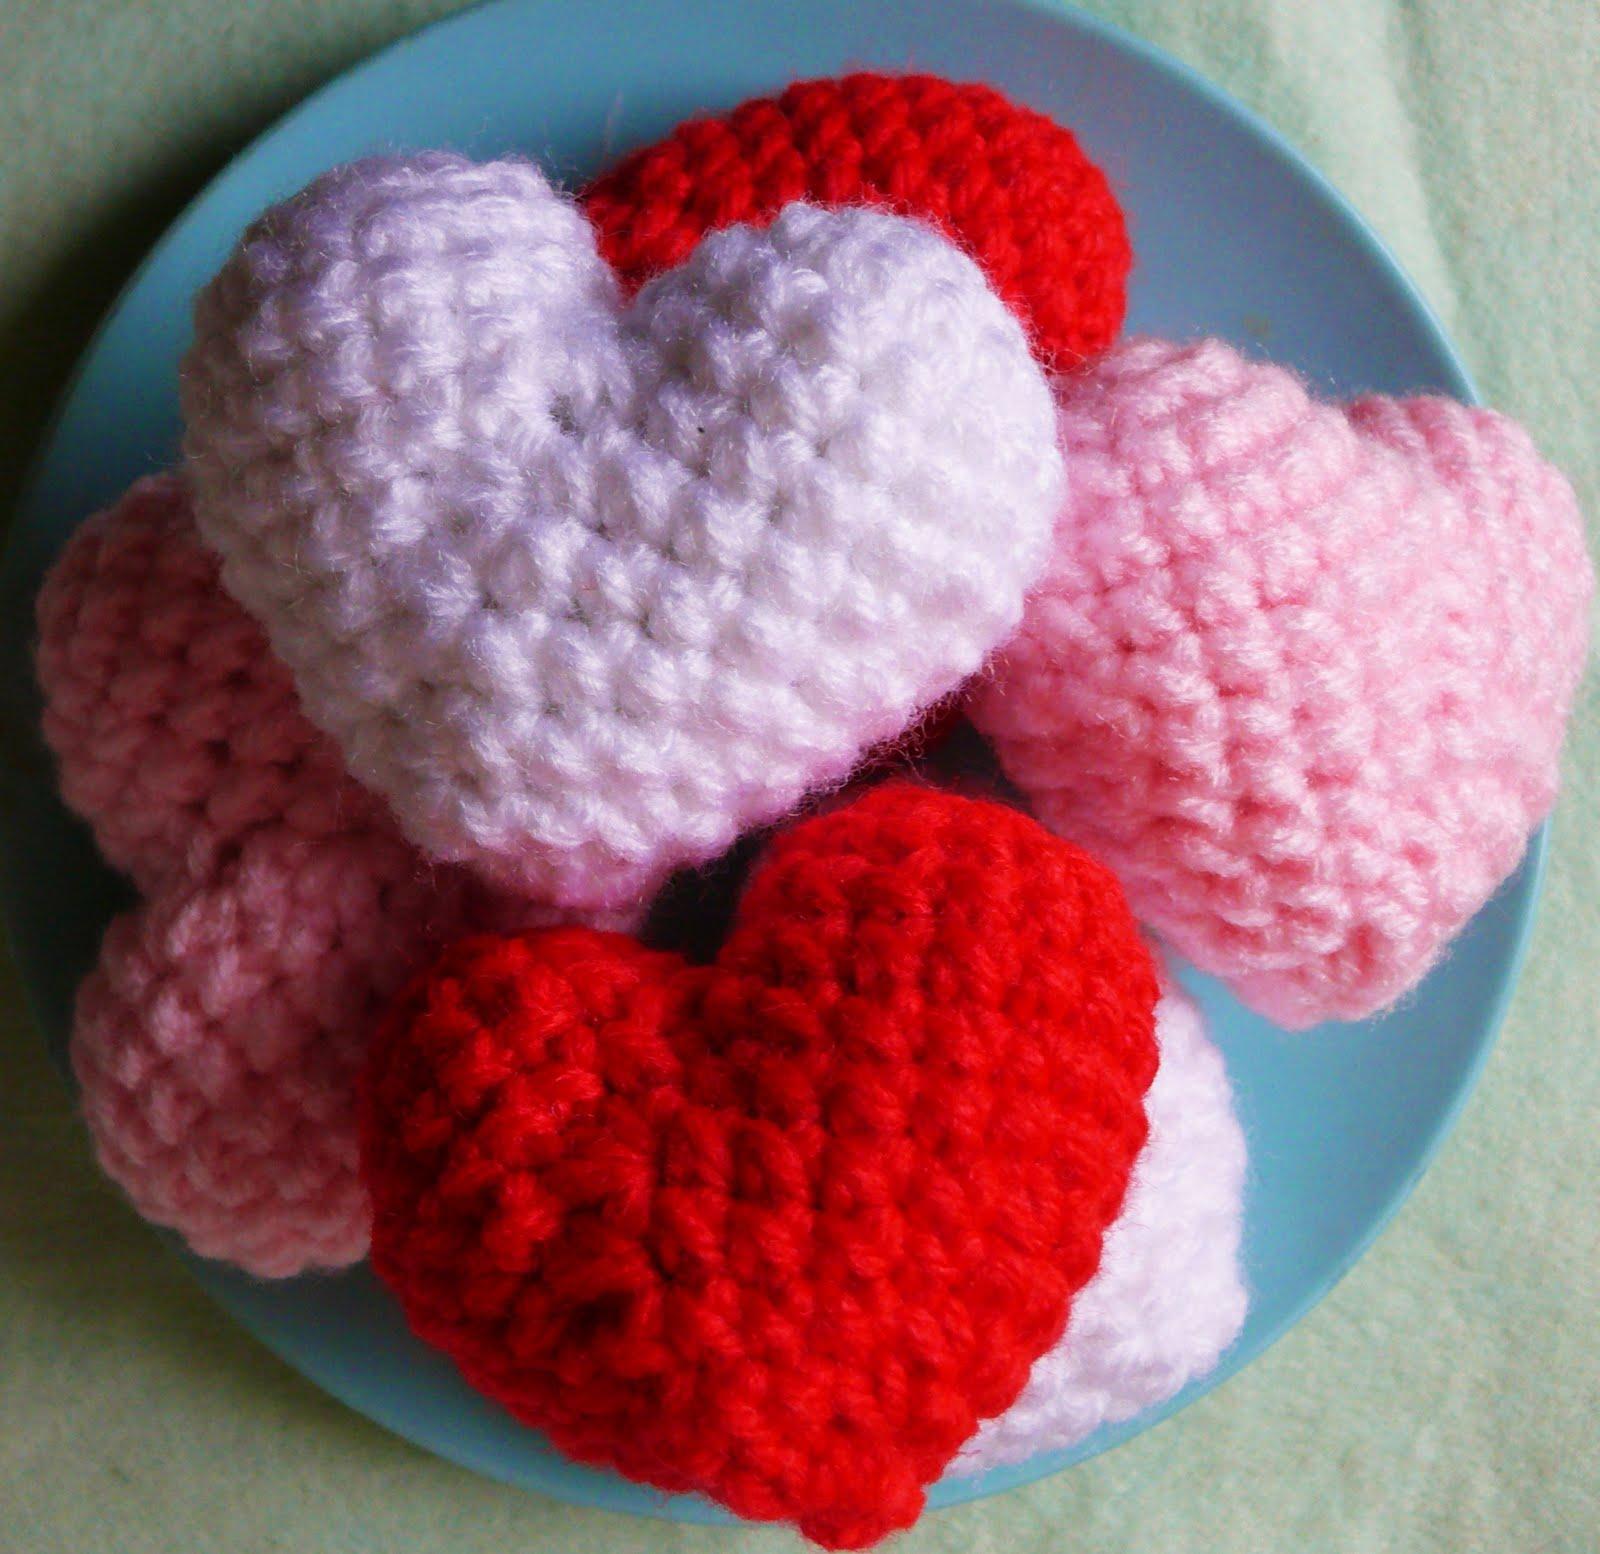 http://4.bp.blogspot.com/__QNkU5q5OaI/S8LhW8TwEUI/AAAAAAAAALY/93S689pqsDQ/s1600/heart%202.JPG